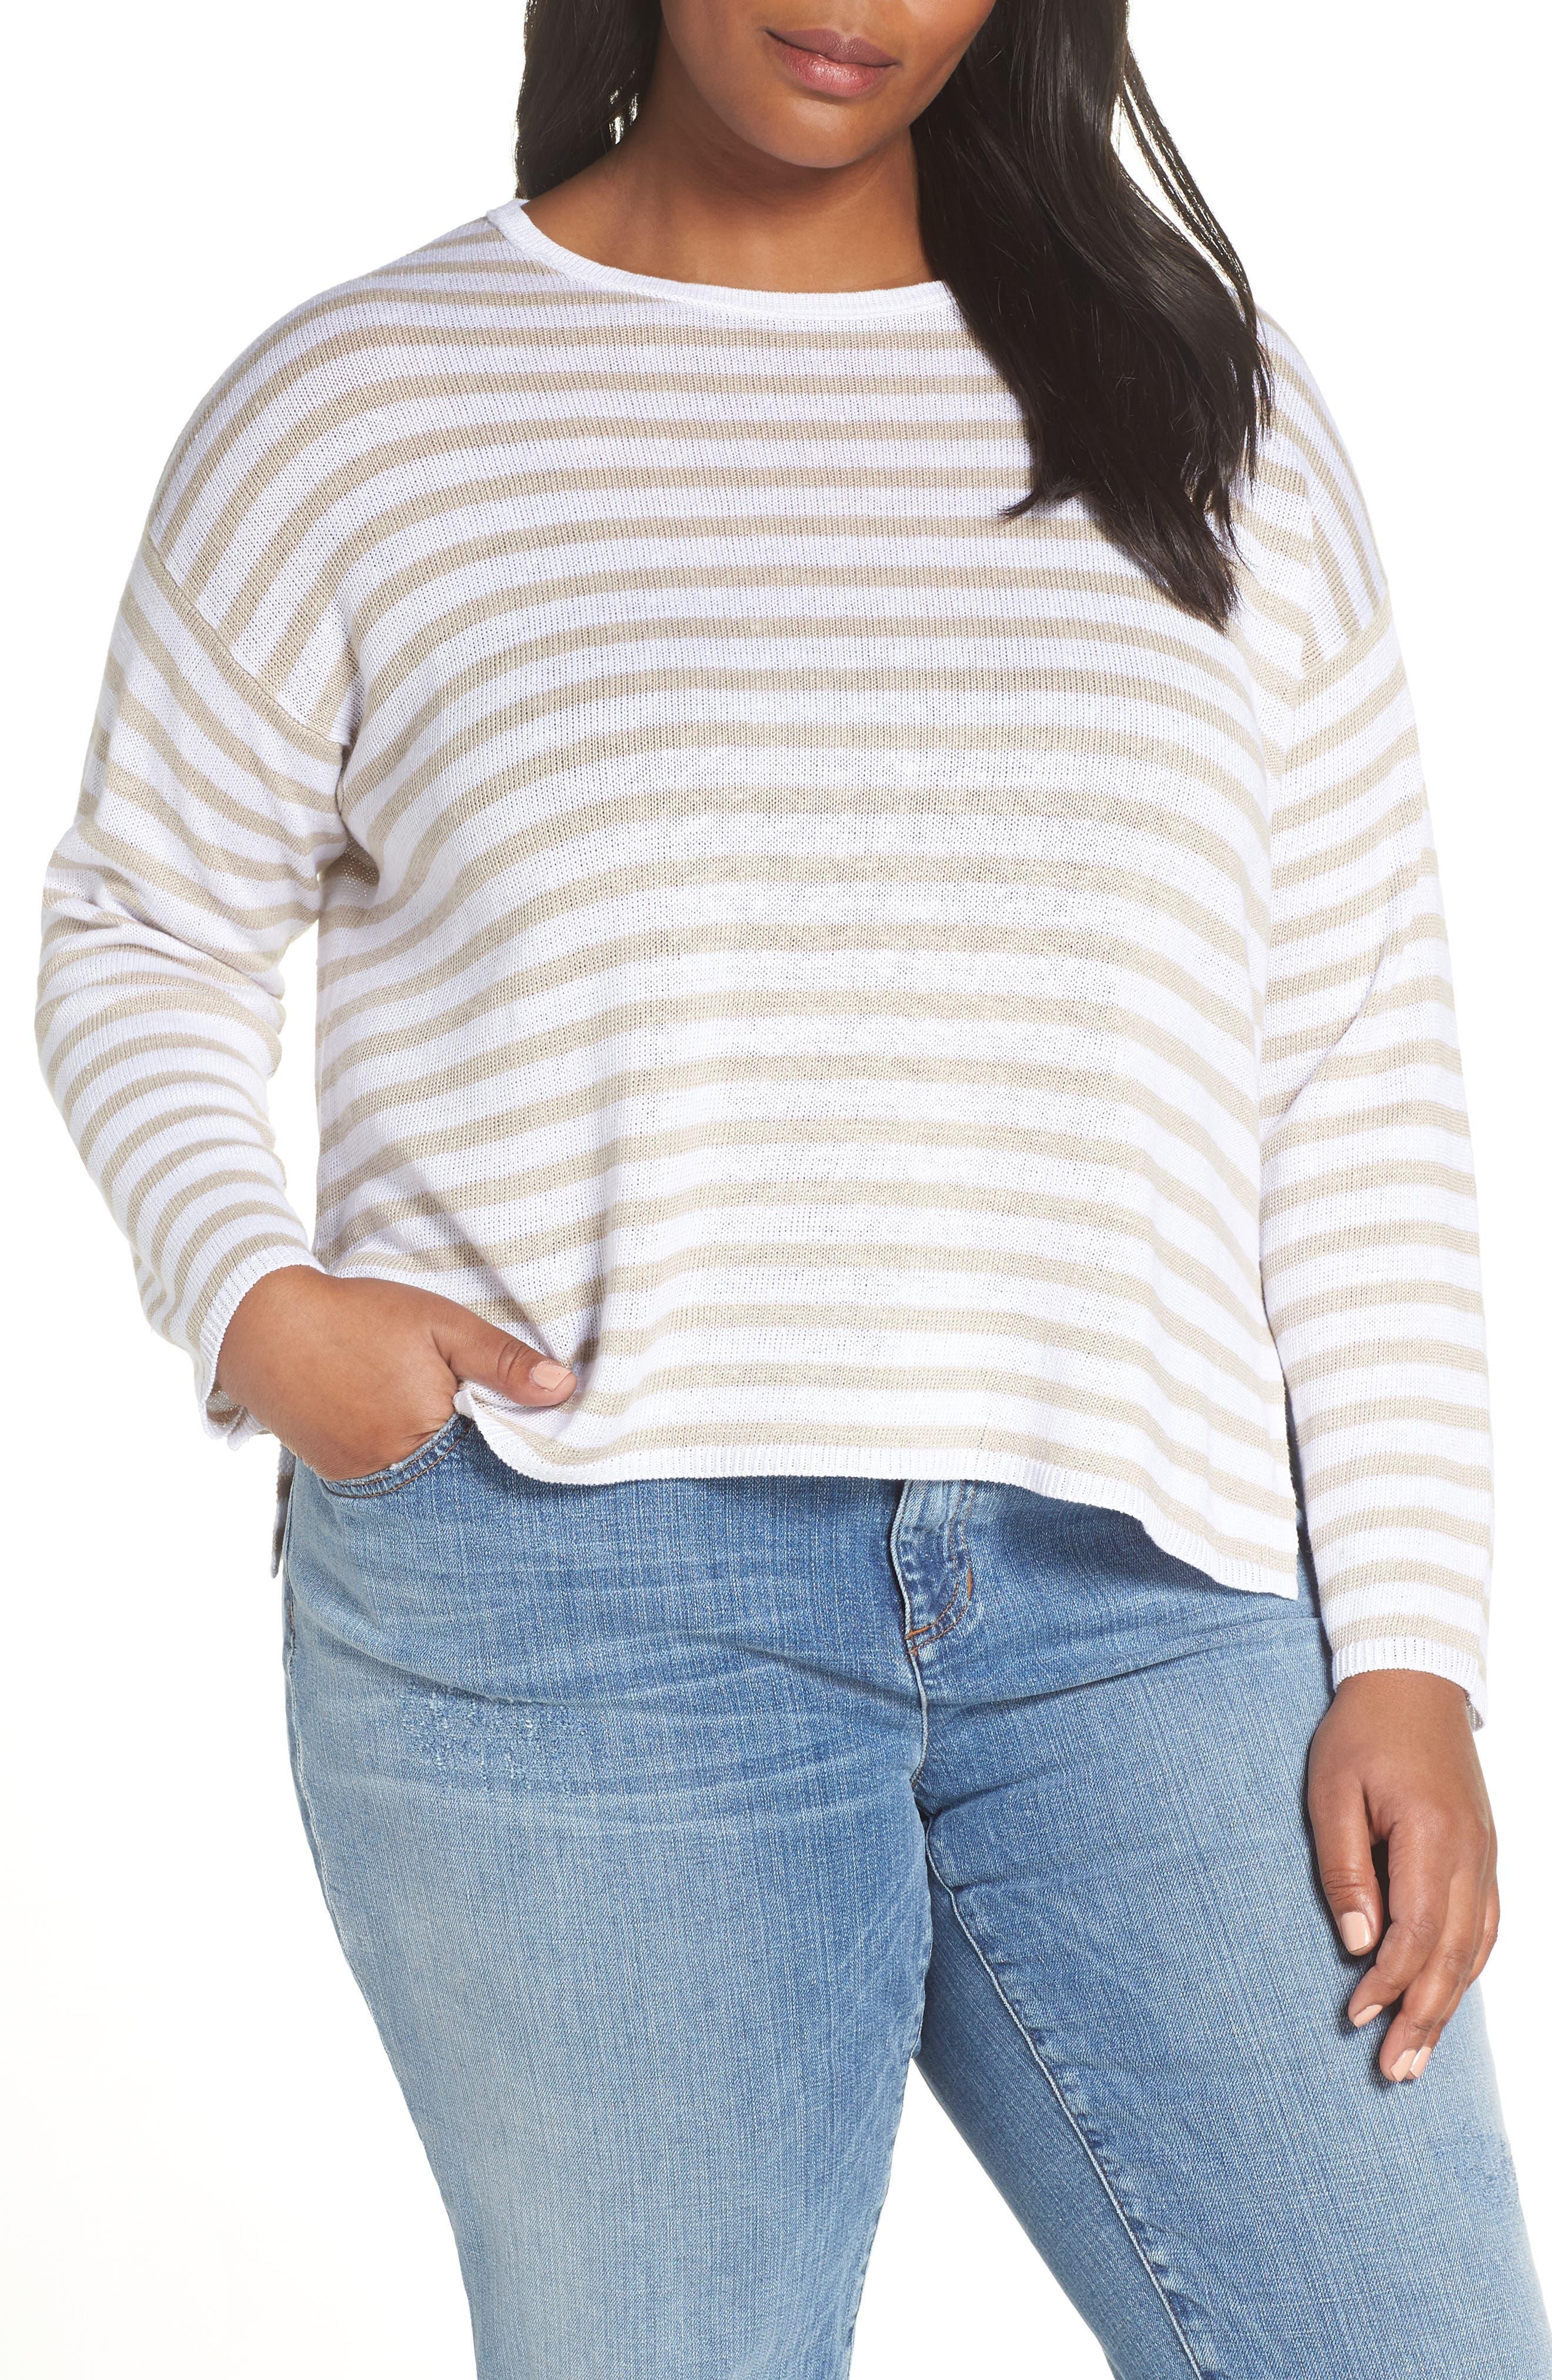 EILEEN FISHER, Stripe Organic Linen Sweater, Main thumbnail 1, color, WHITE NATURAL